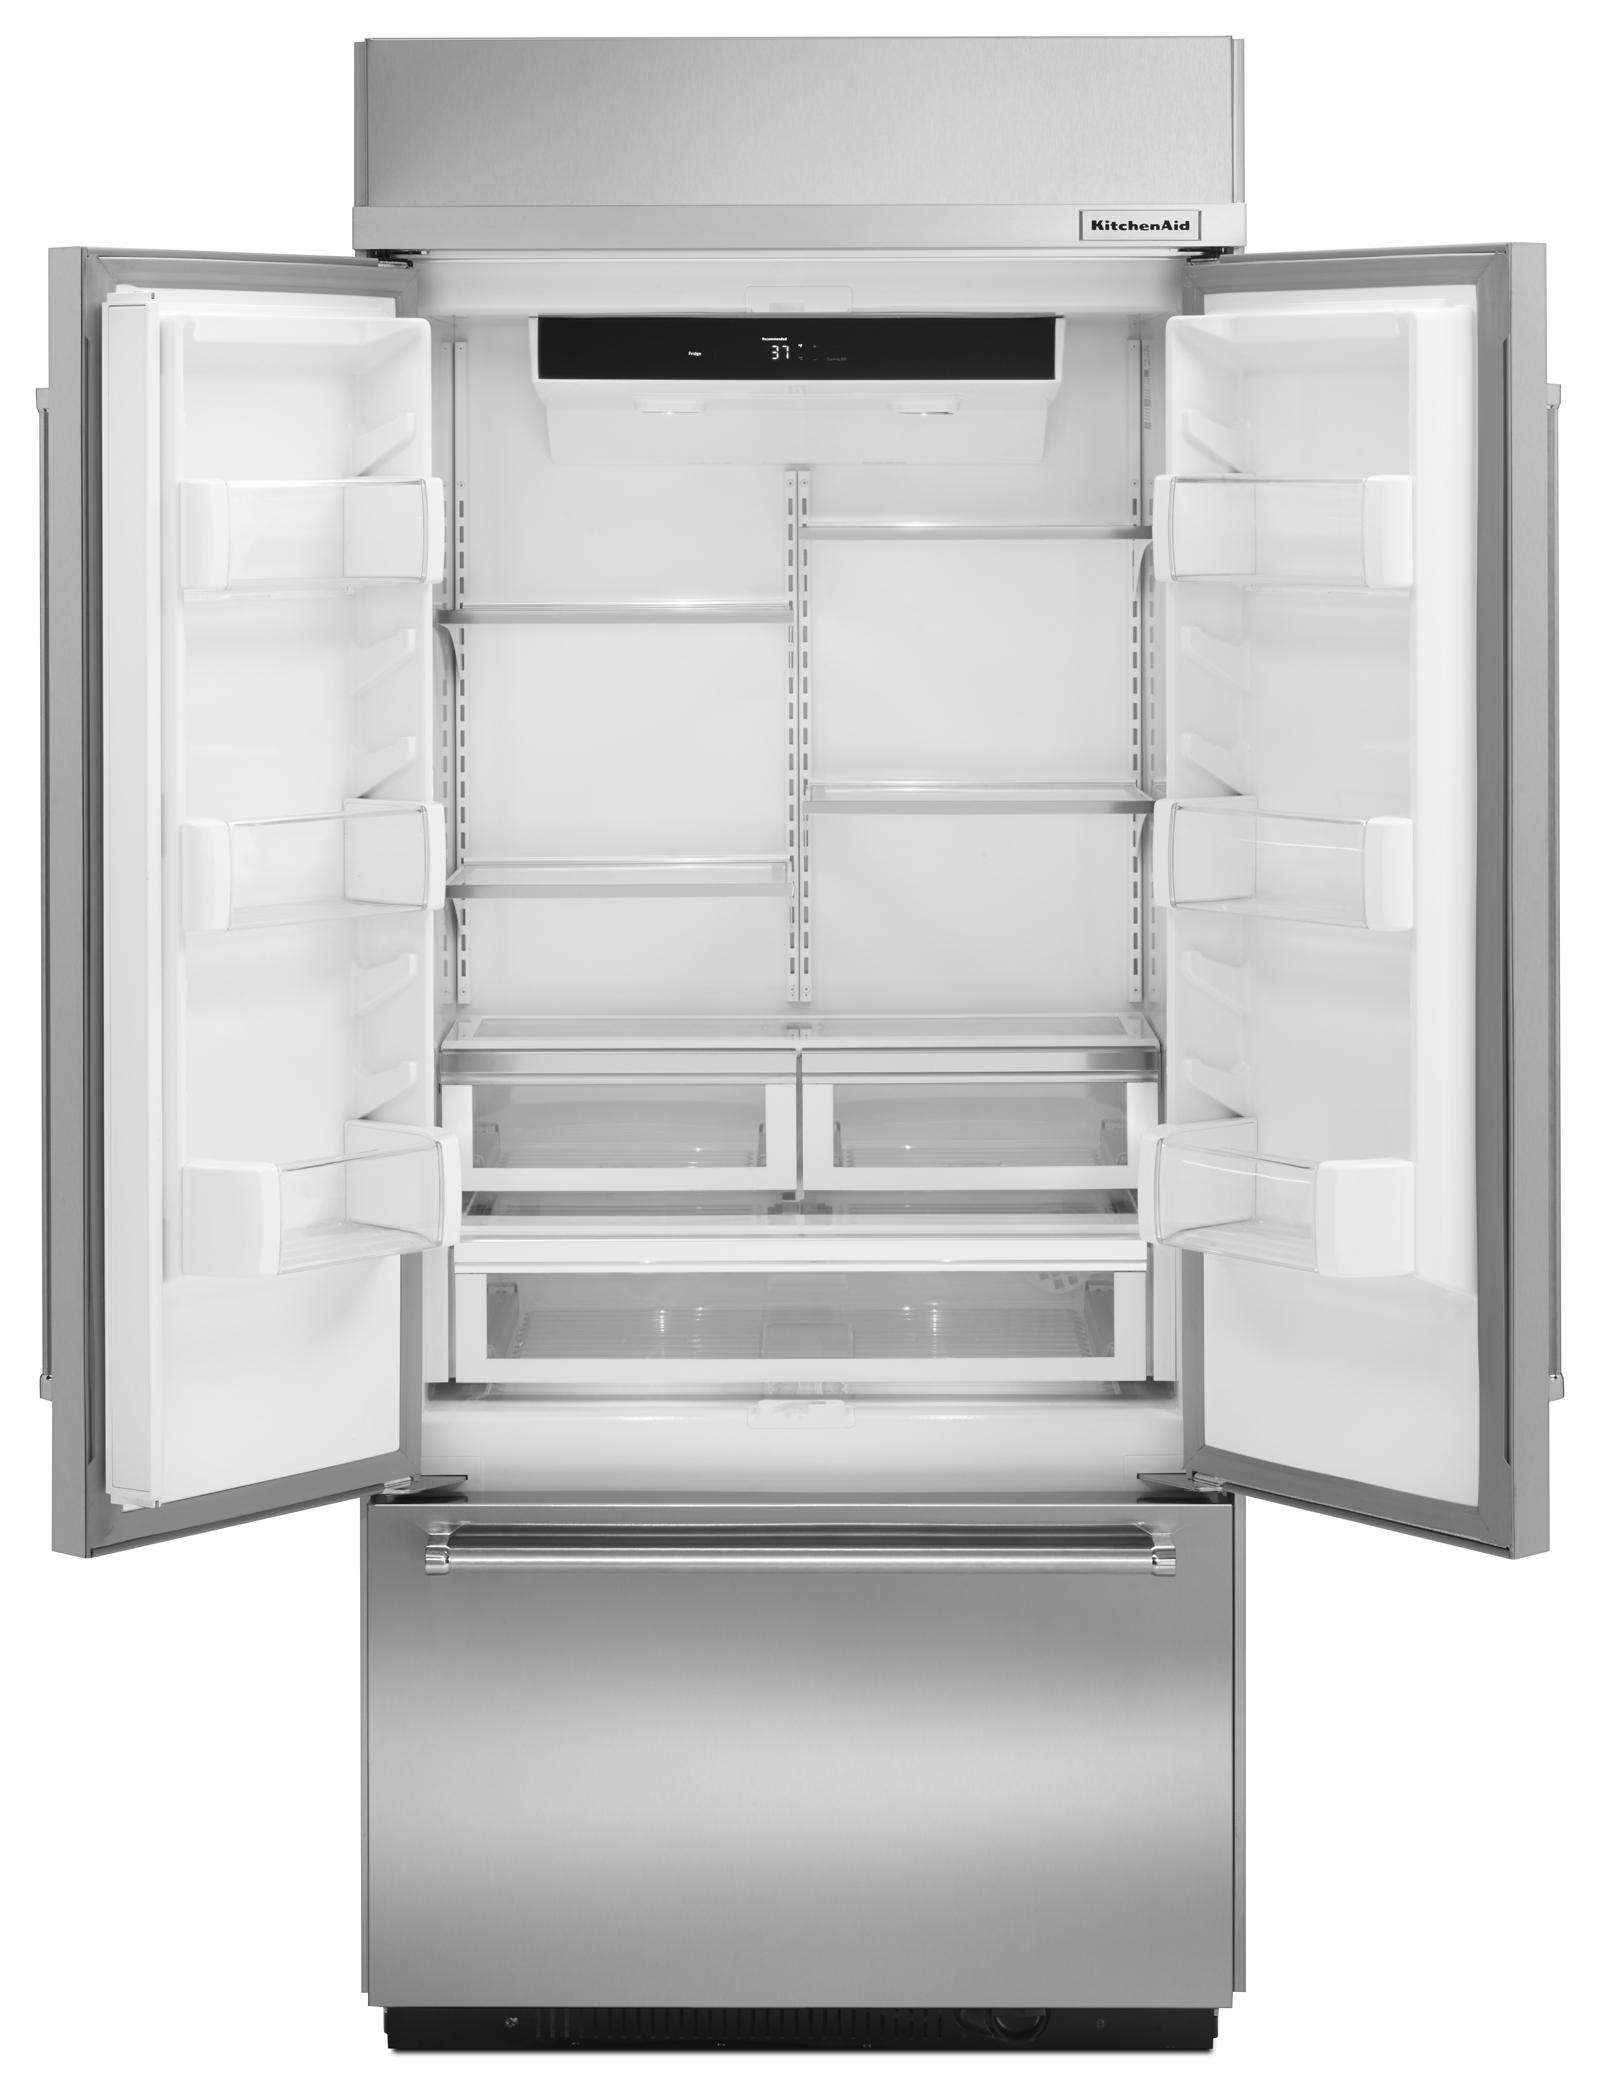 KitchenAid KBFN406ESS 20.8 cu. ft. Built-In French Door Refrigerator - Stainless Steel